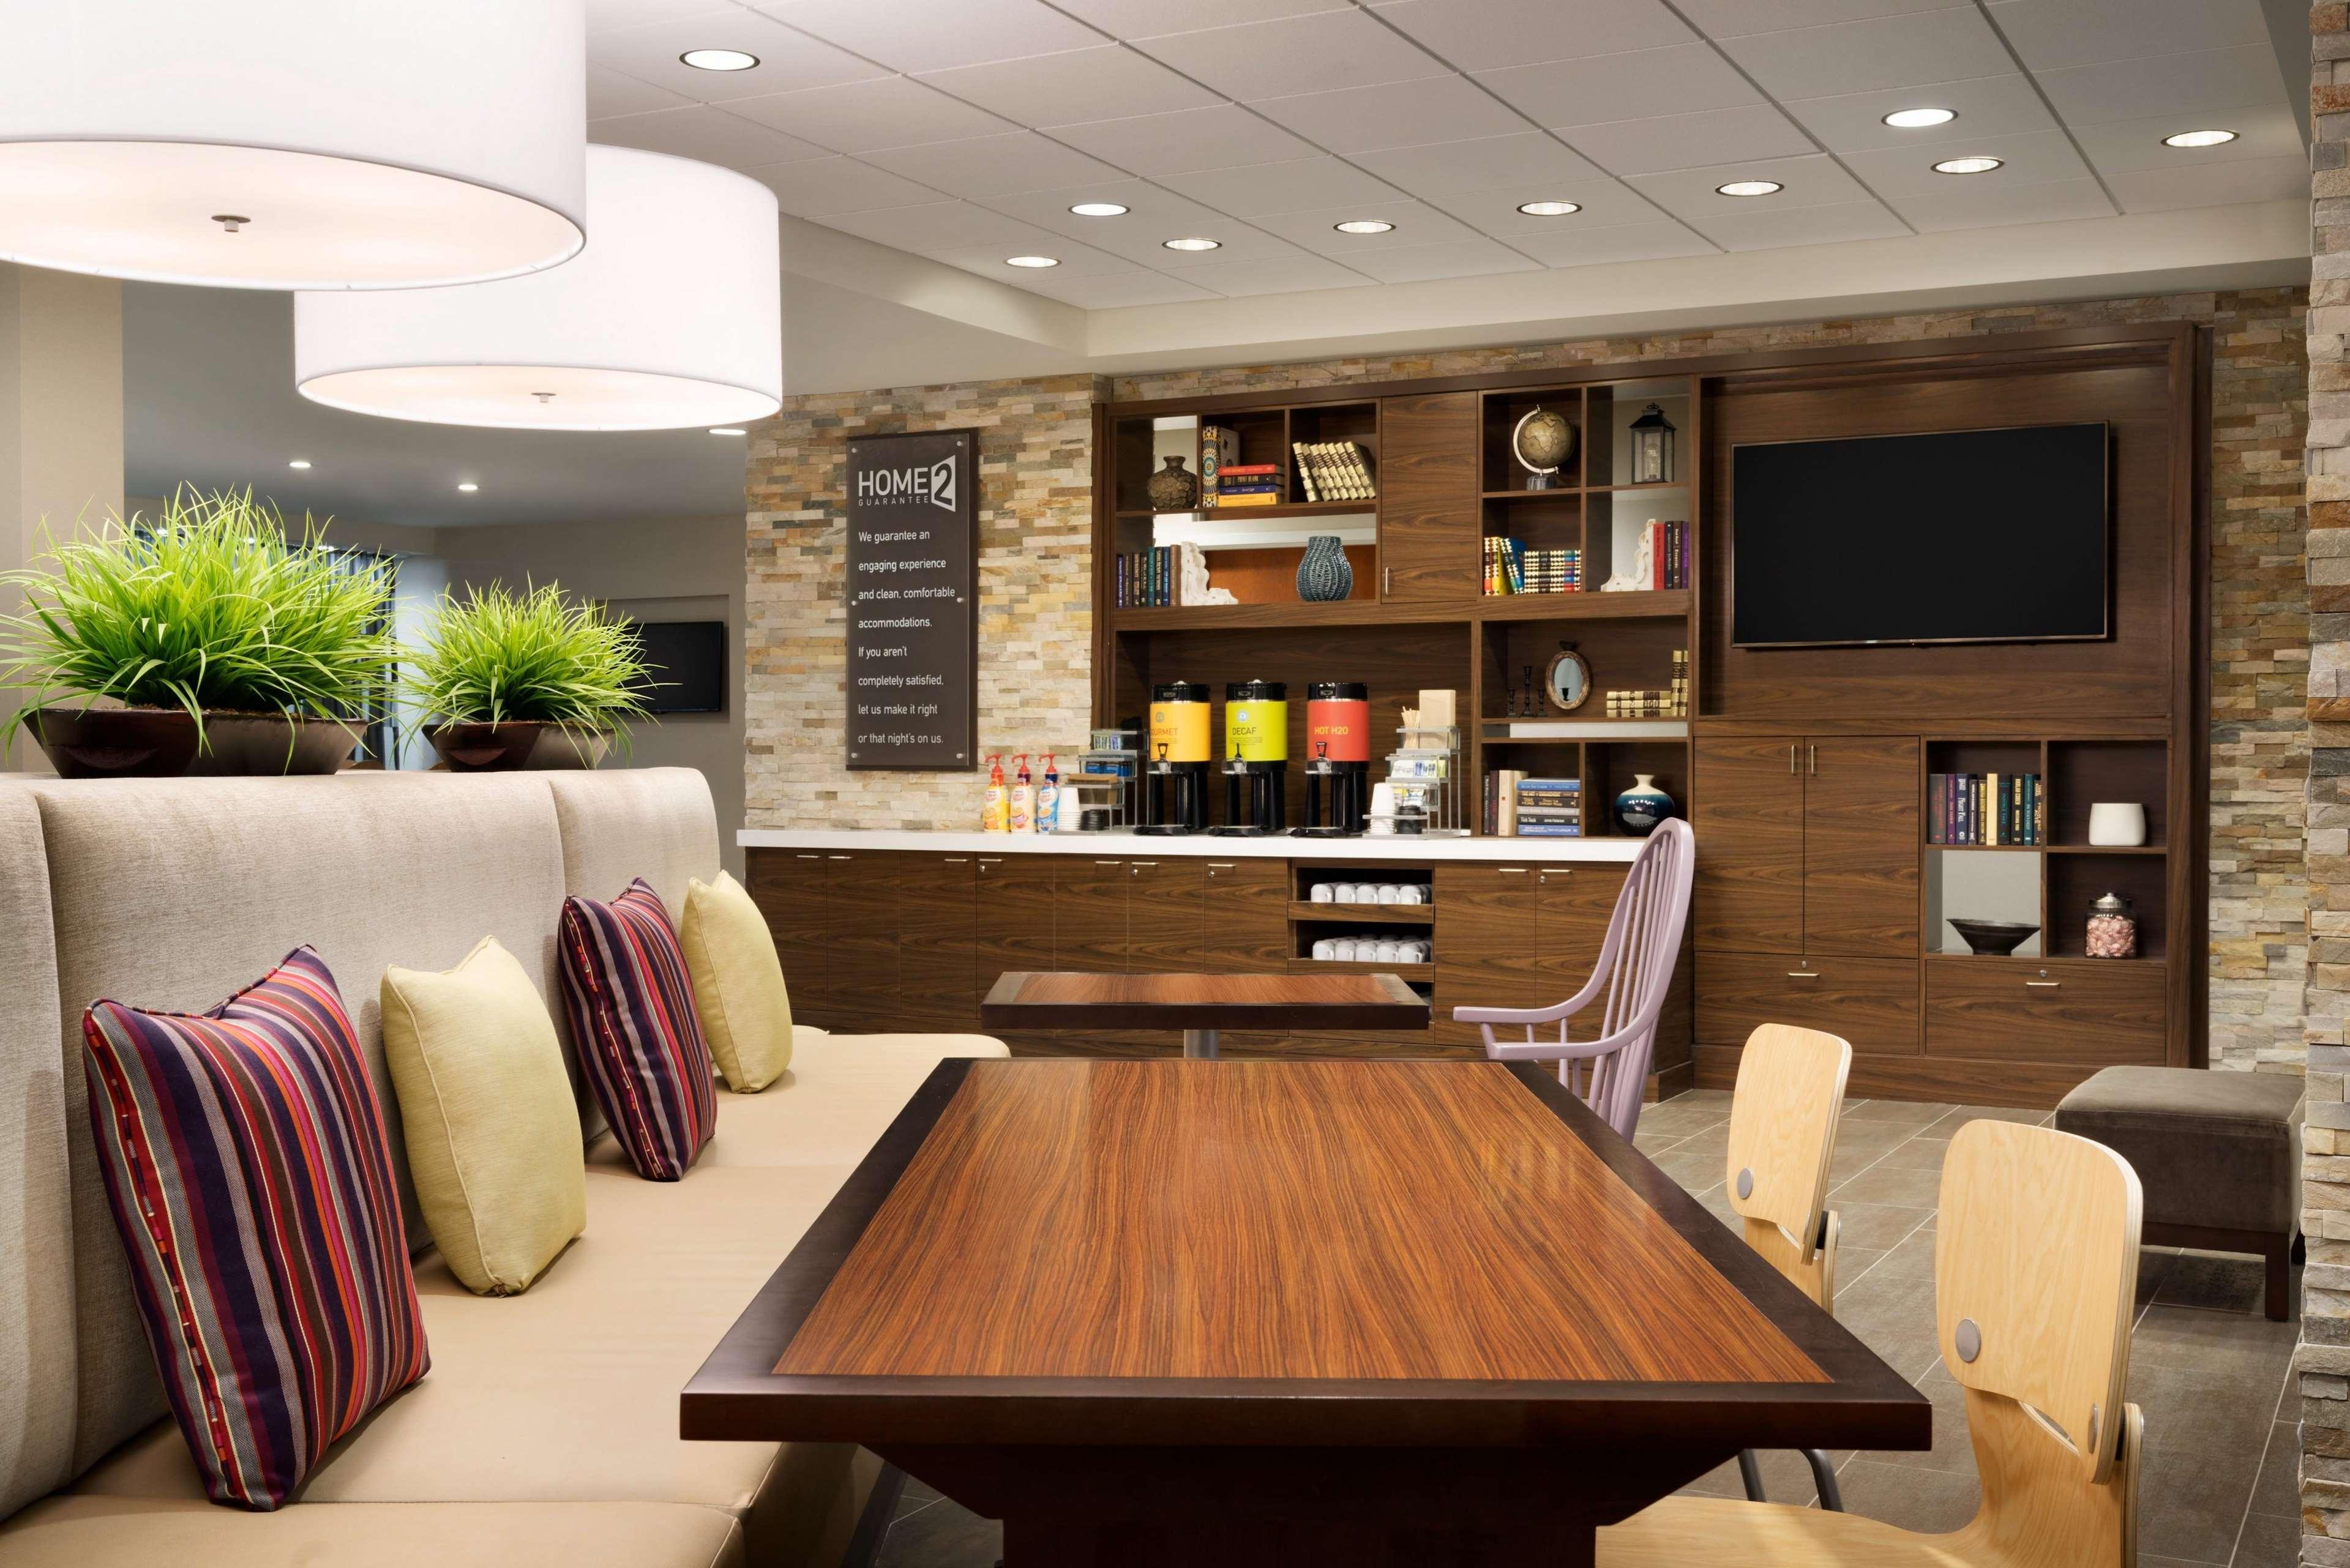 Home2 Suites by Hilton Leavenworth Downtown image 8